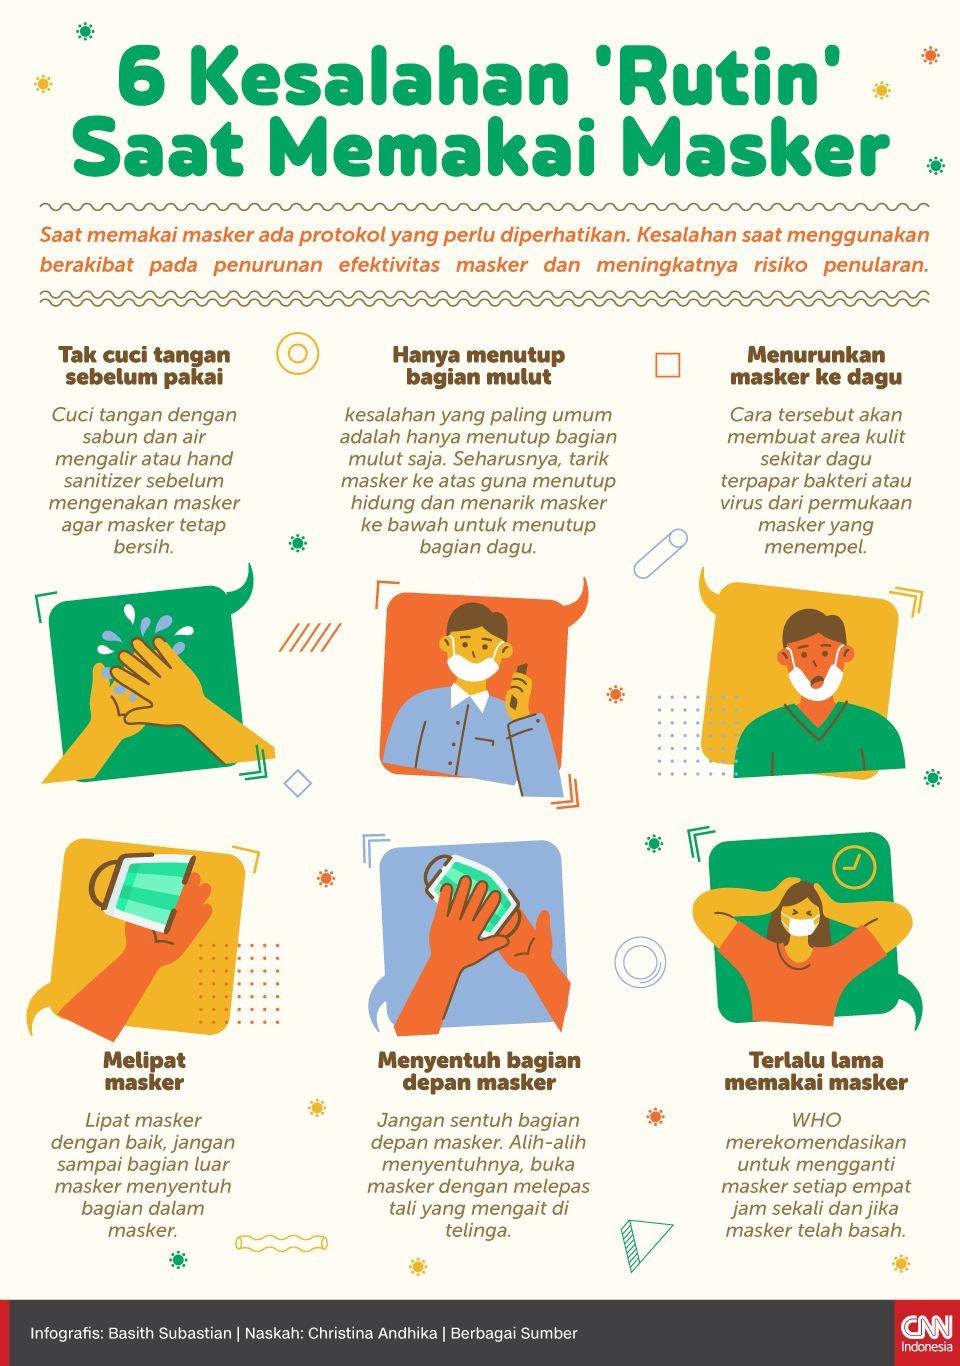 Infografis 6 Kesalahan 'Rutin' Saat Memakai Masker